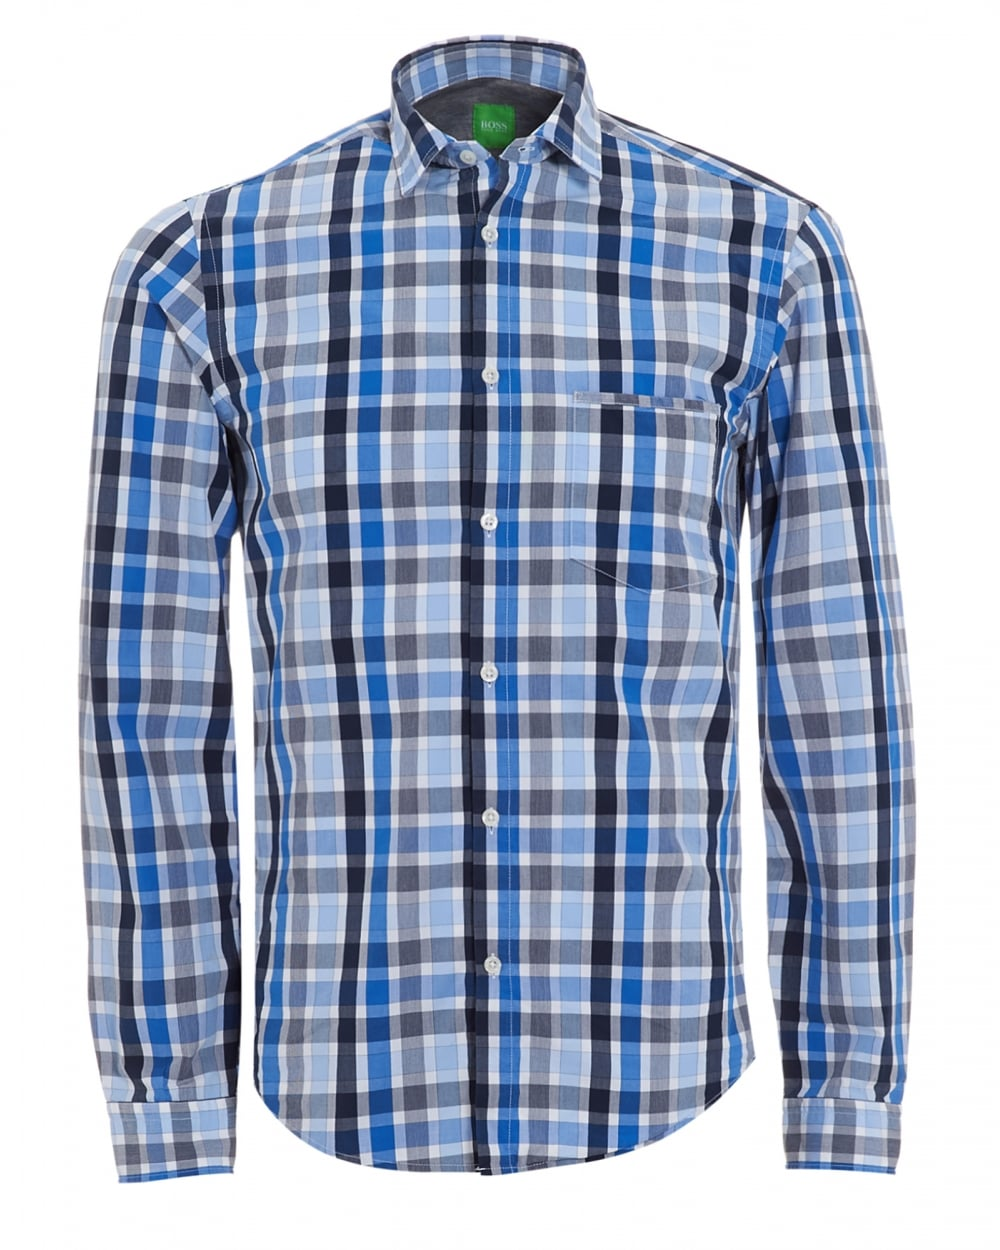 Mens C-Bansi Shirt, Blue Check Shirt